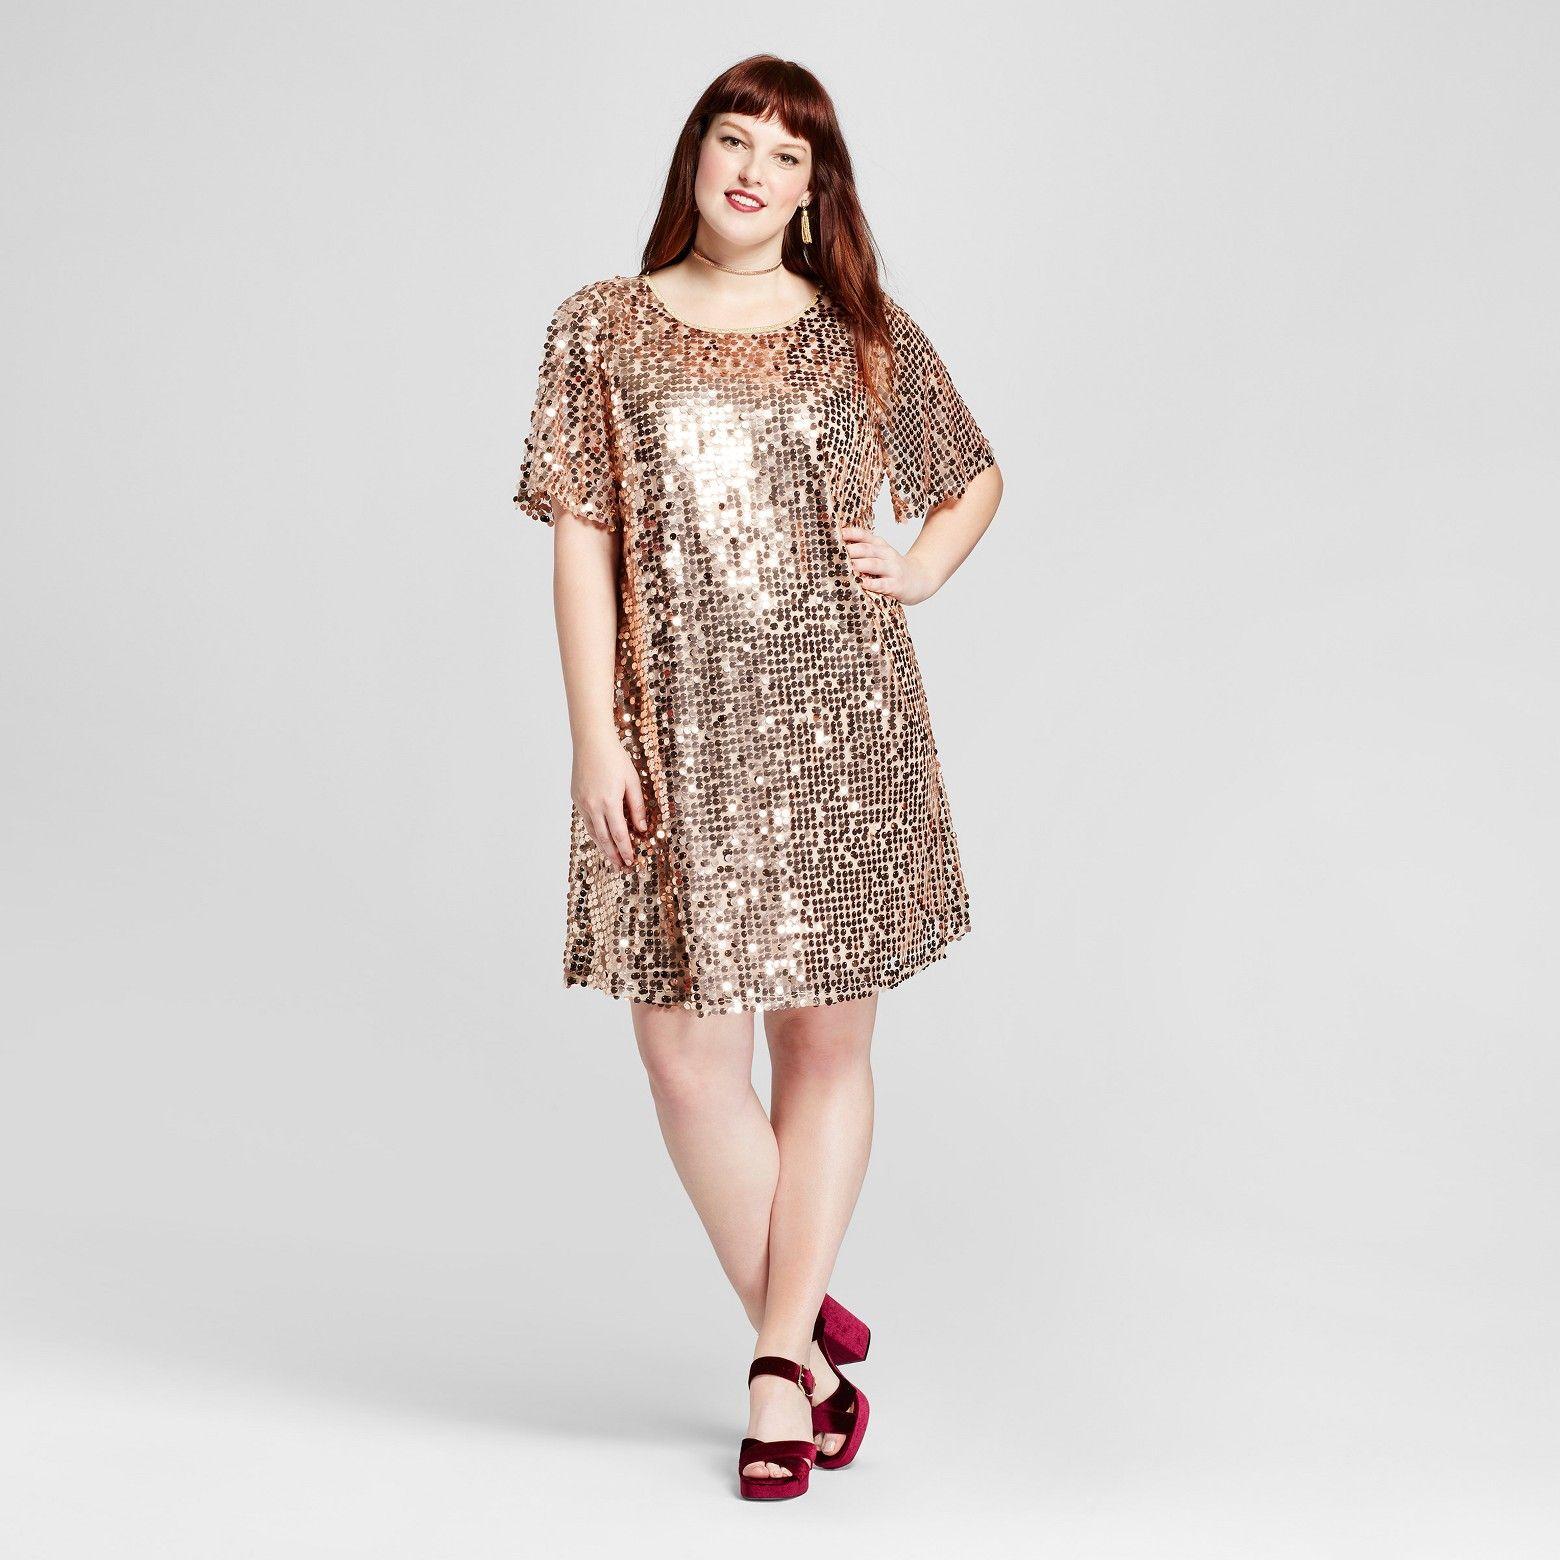 Rose Gold Short Sleeve Sequin Dress From Xhilaration Target Com Plus Size Sequin Dresses Plus Size Party Dresses Plus Size Outfits [ 1560 x 1560 Pixel ]